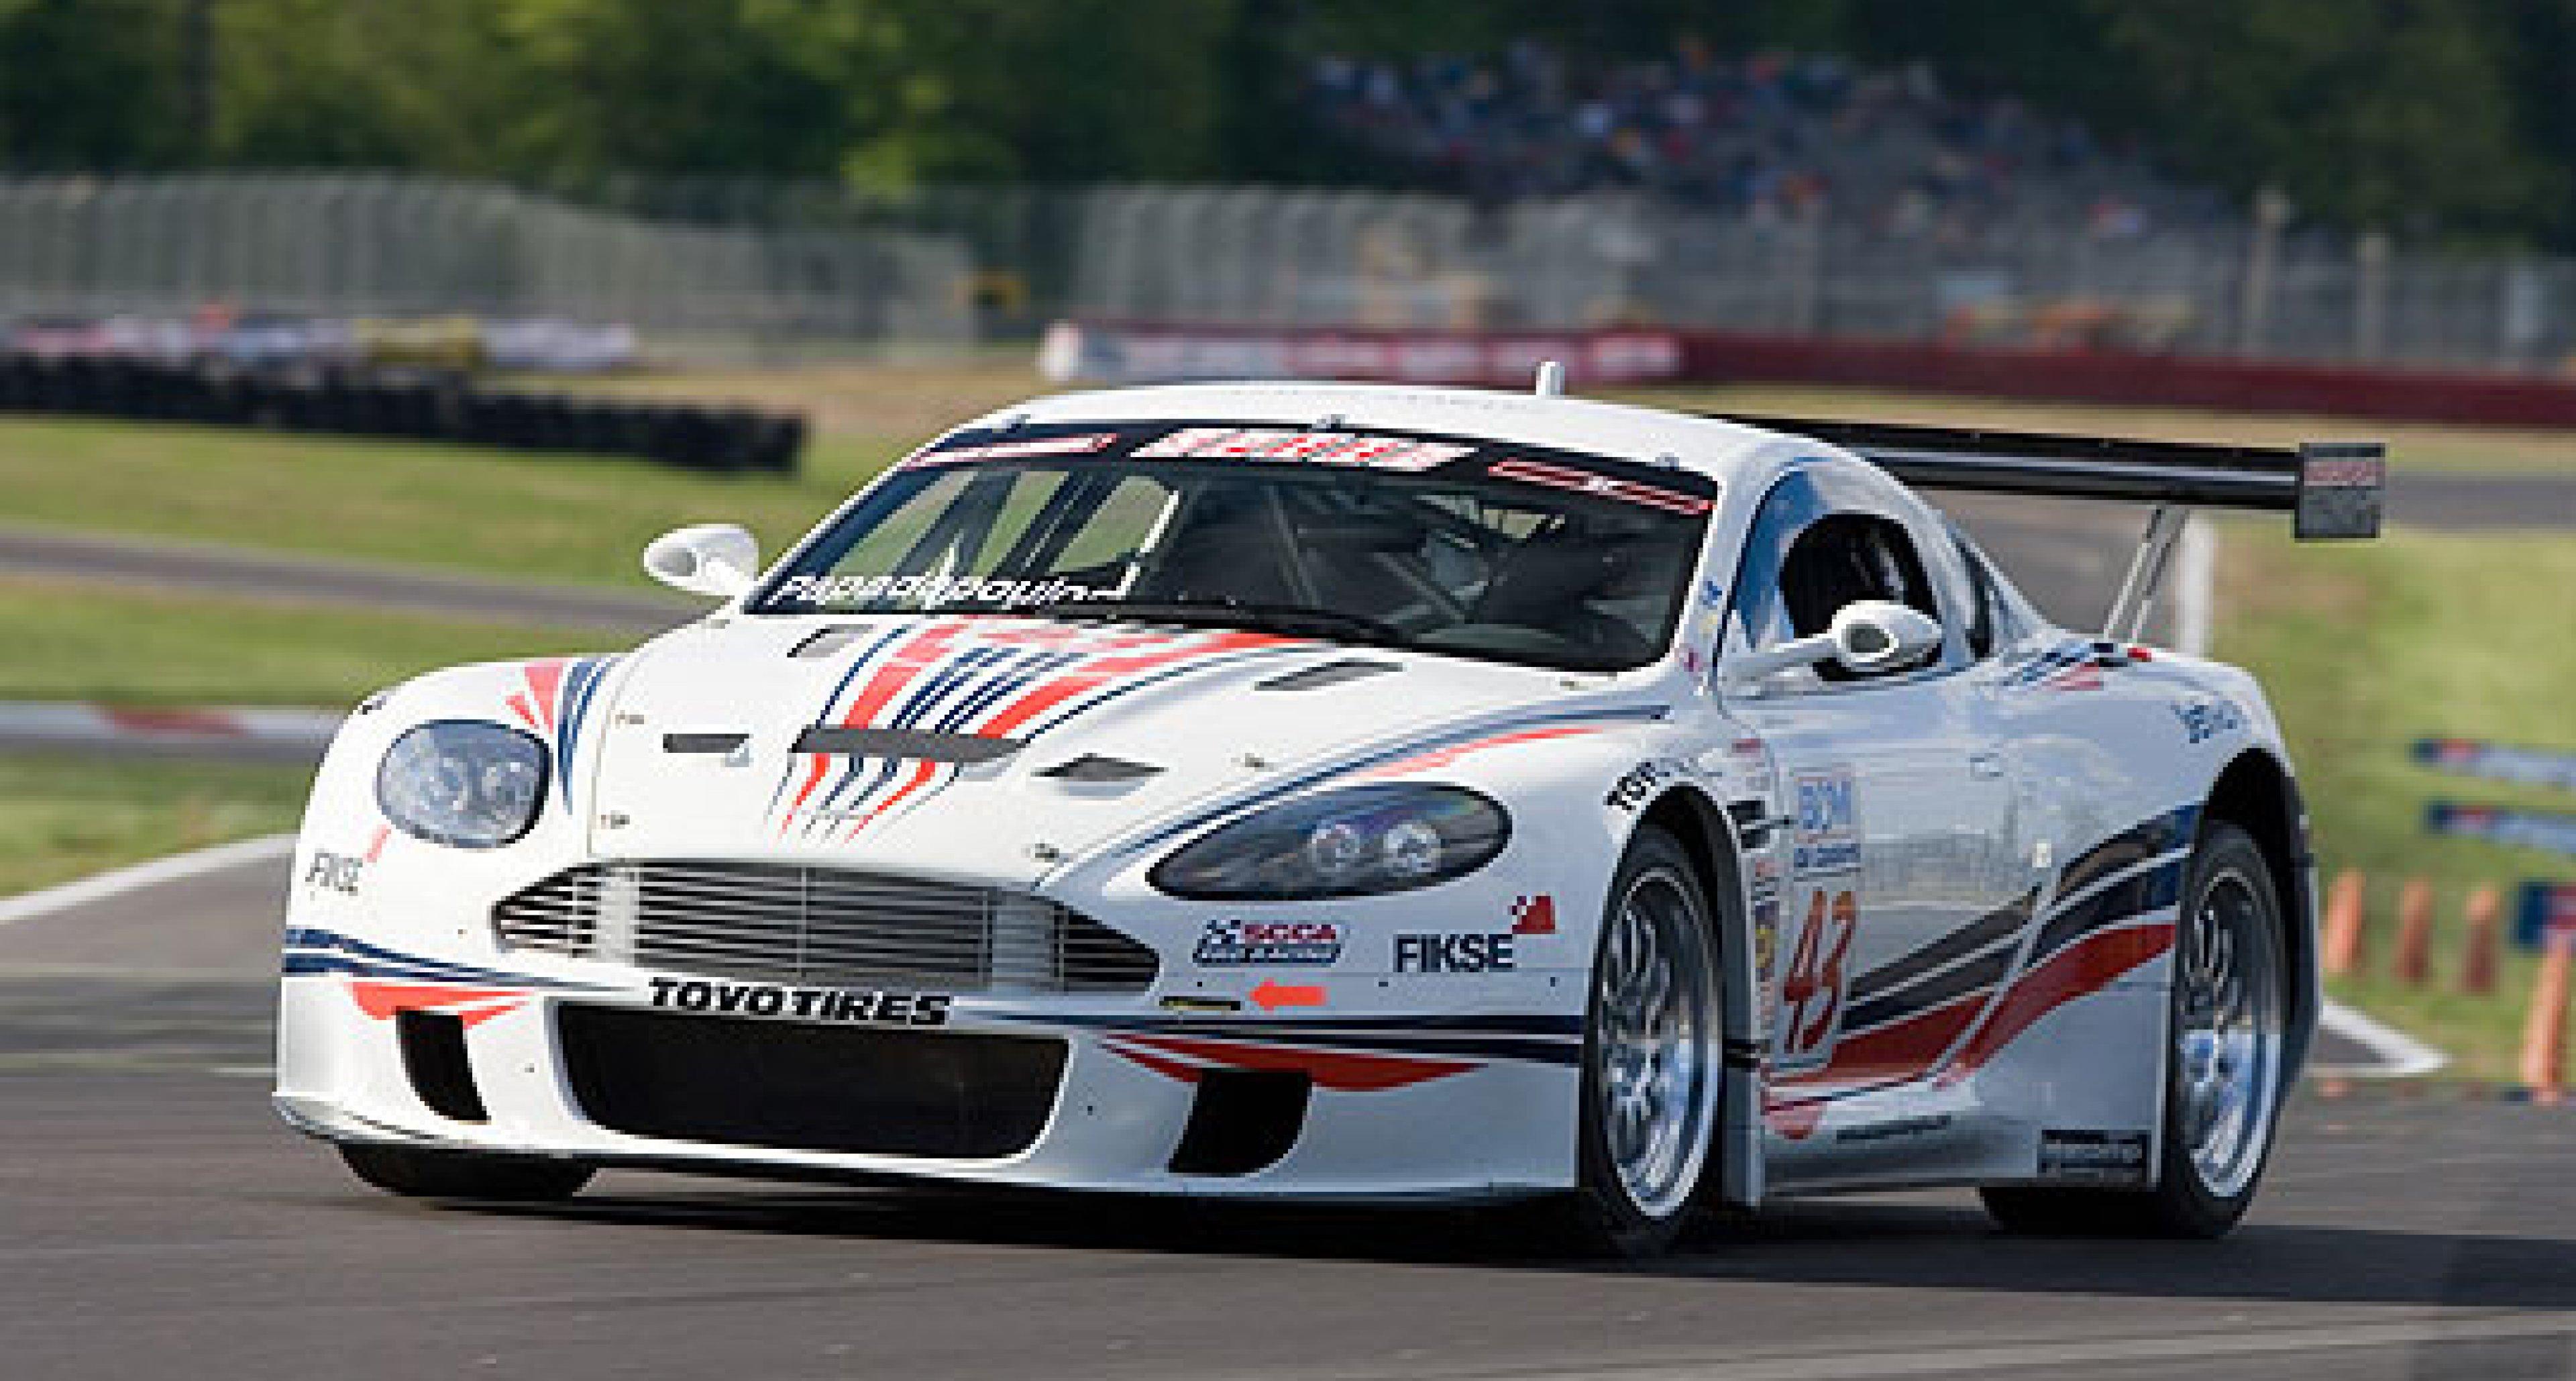 Autosport Designs Aston Martin DBRS9s at Mid-Ohio 2006